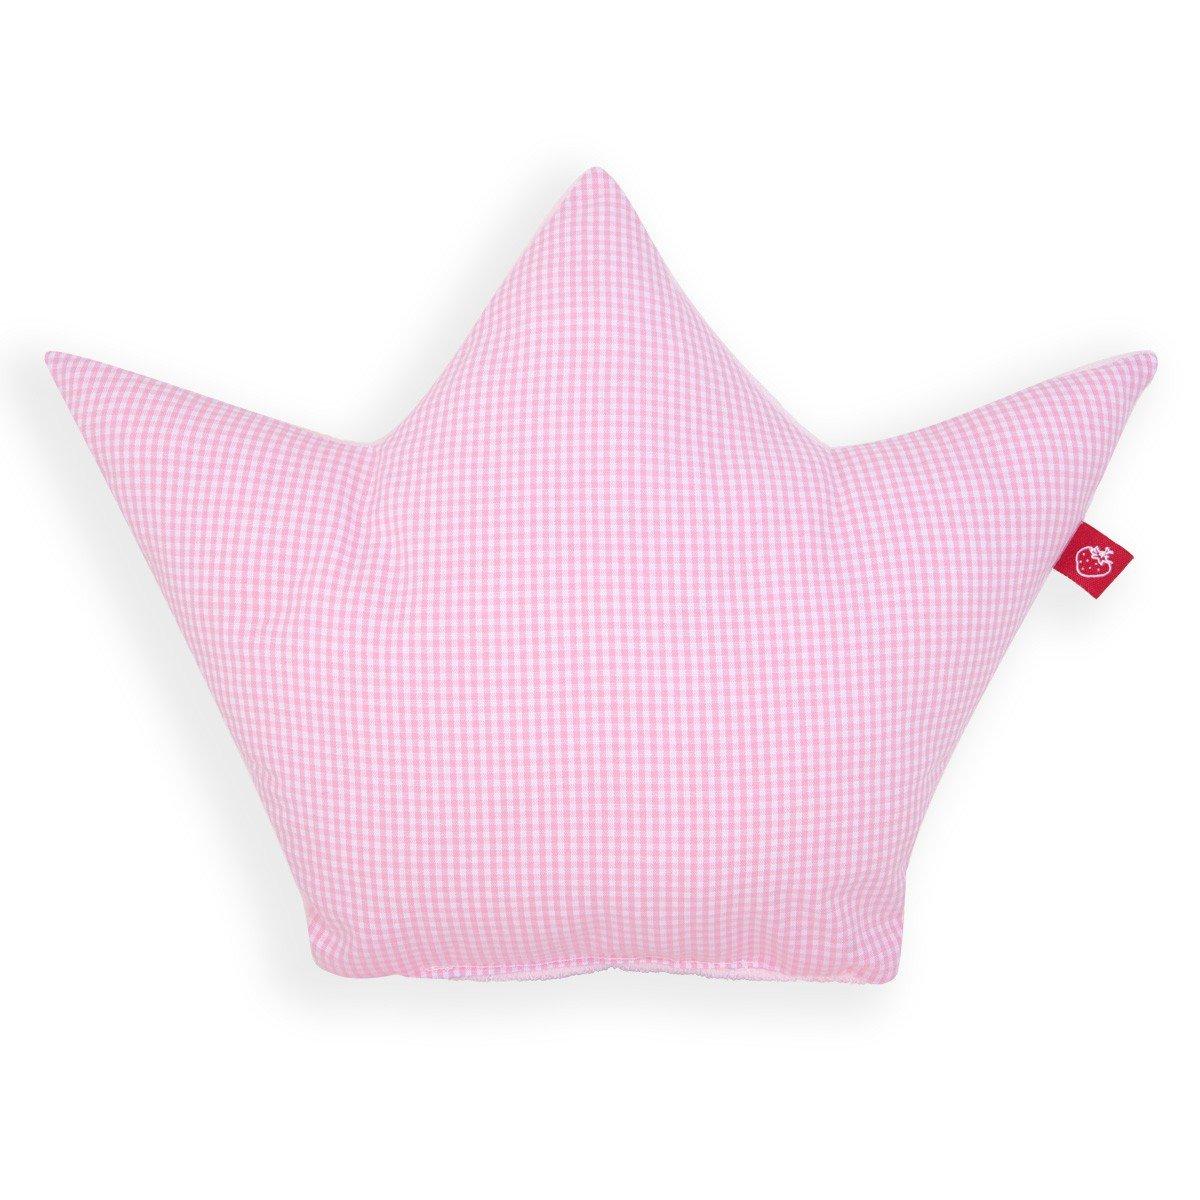 Vichy Karo rosa//wei/ß La Fraise Rouge 4251005602188 Kissen Krone Prinzessin